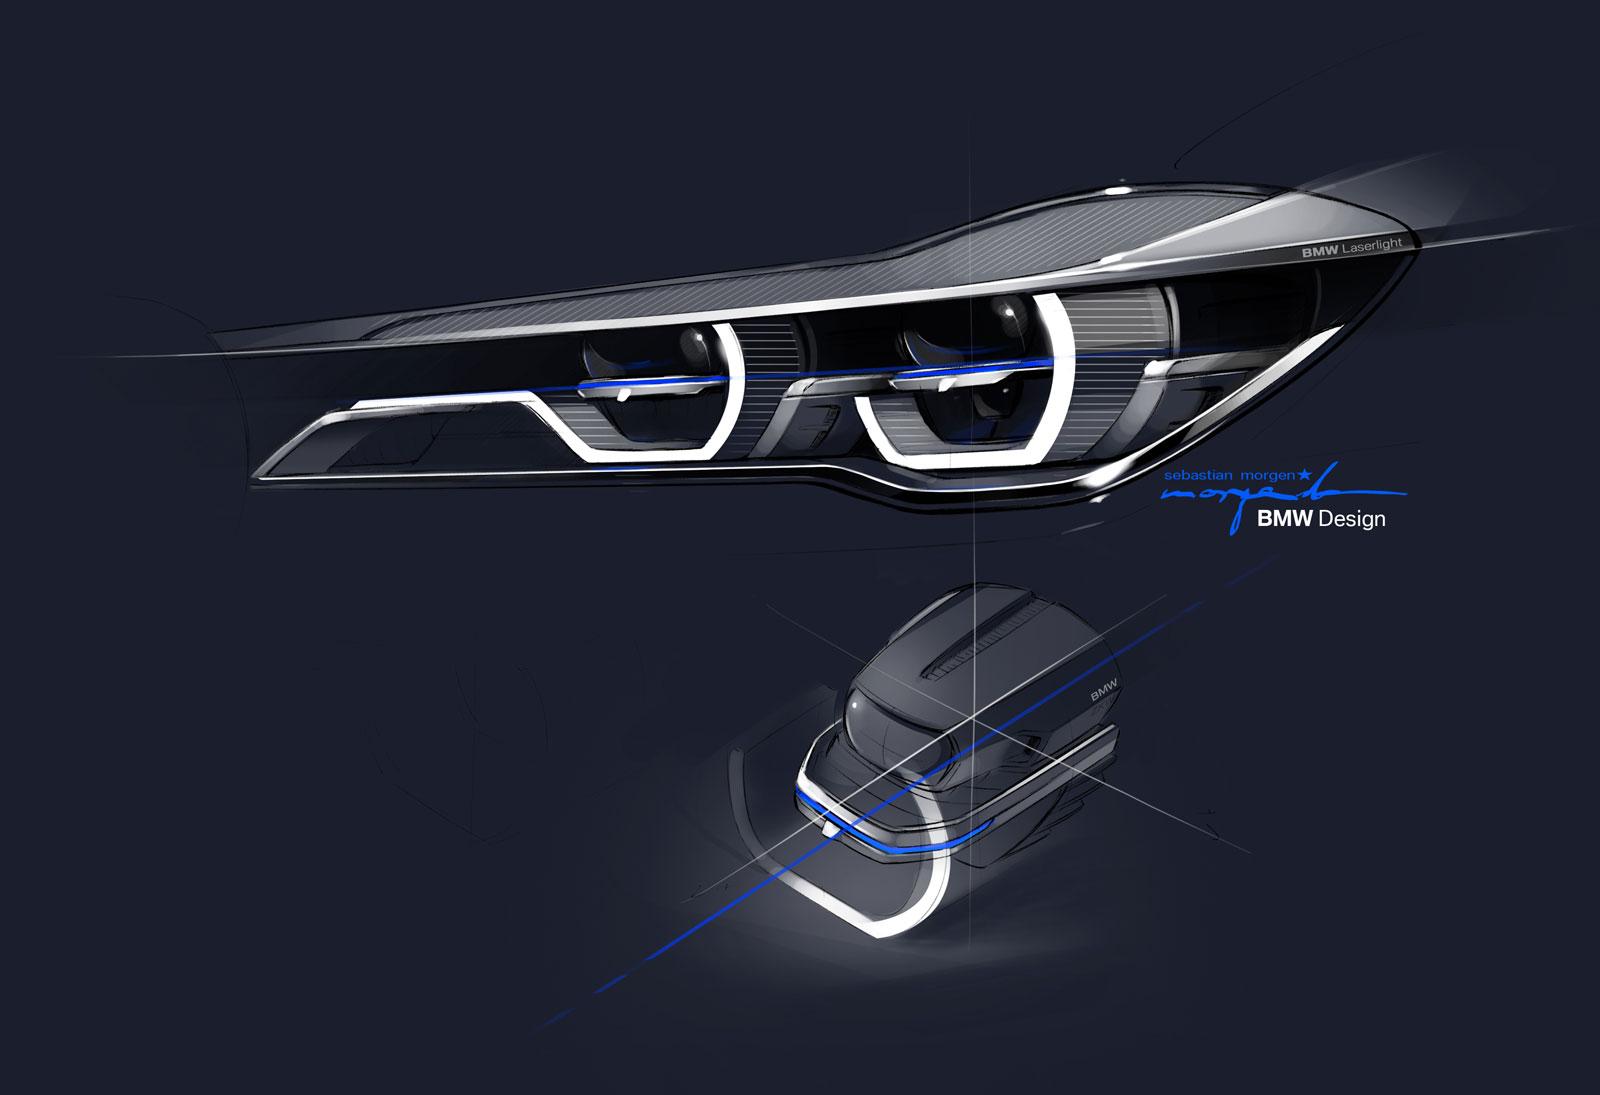 BMW 7 Series Headlight Design Sketch - Car Body Design